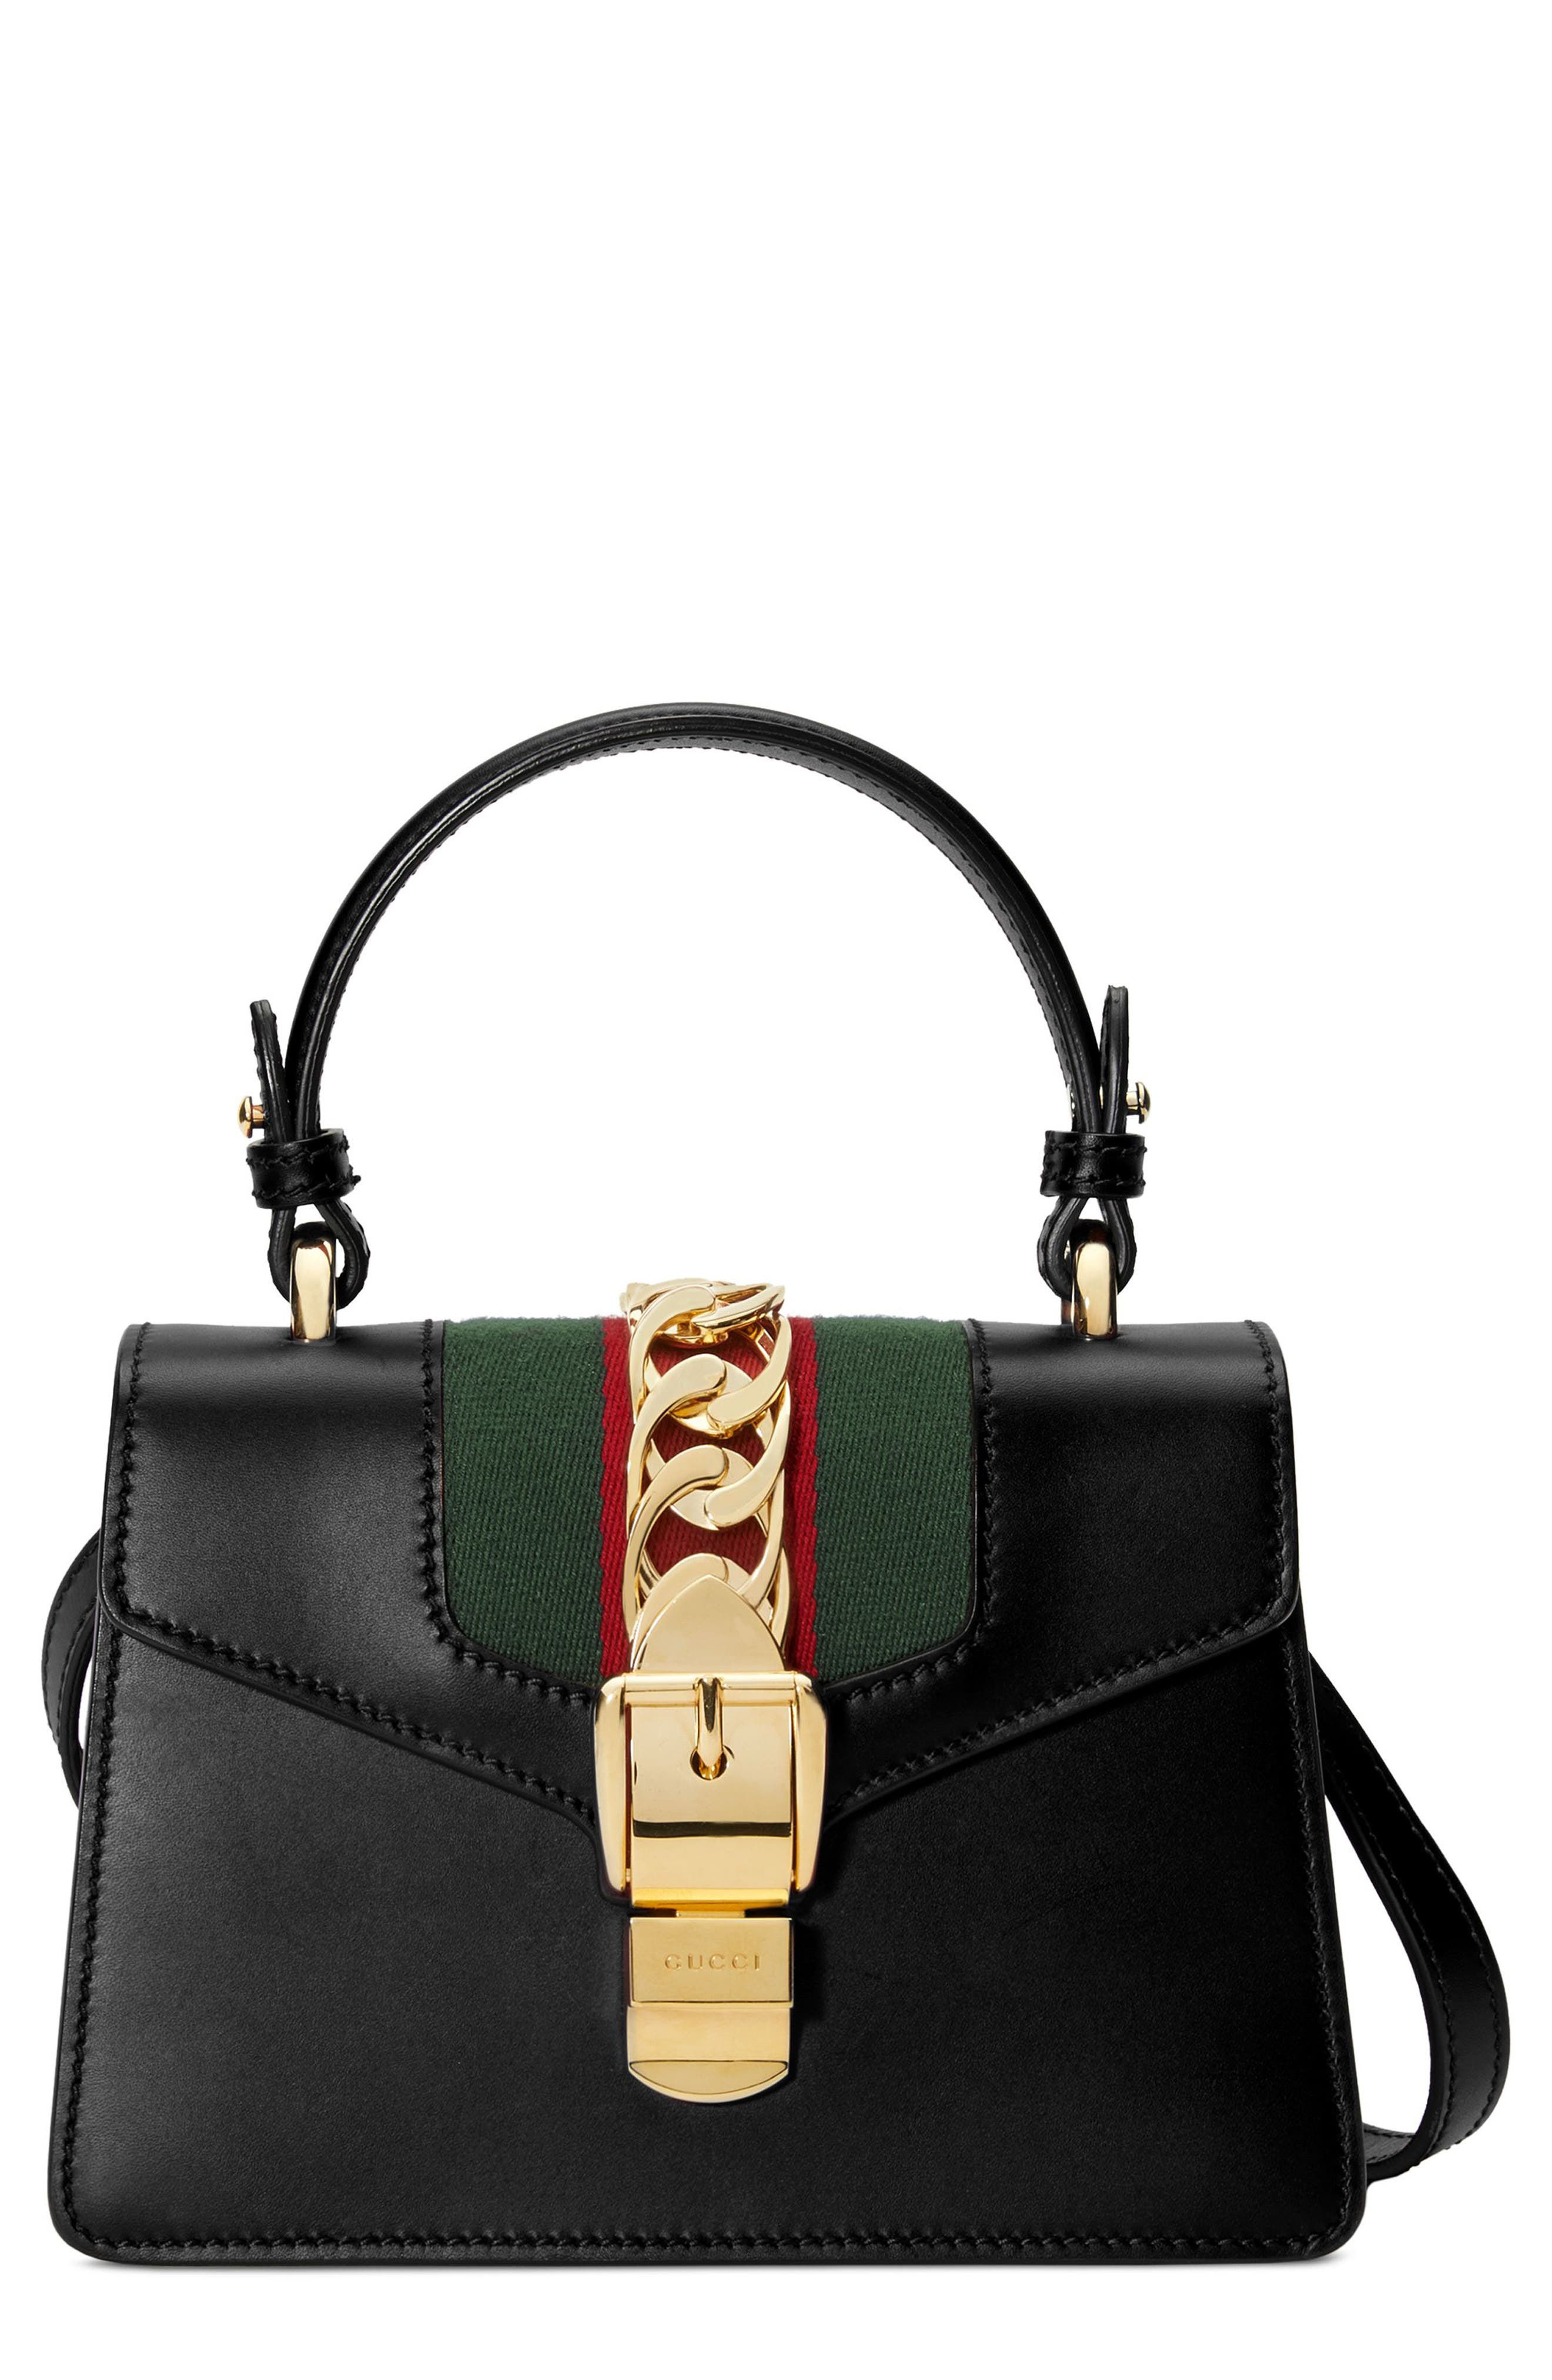 Mini Sylvie Top Handle Leather Shoulder Bag,                         Main,                         color, 8639 NERO/VRV